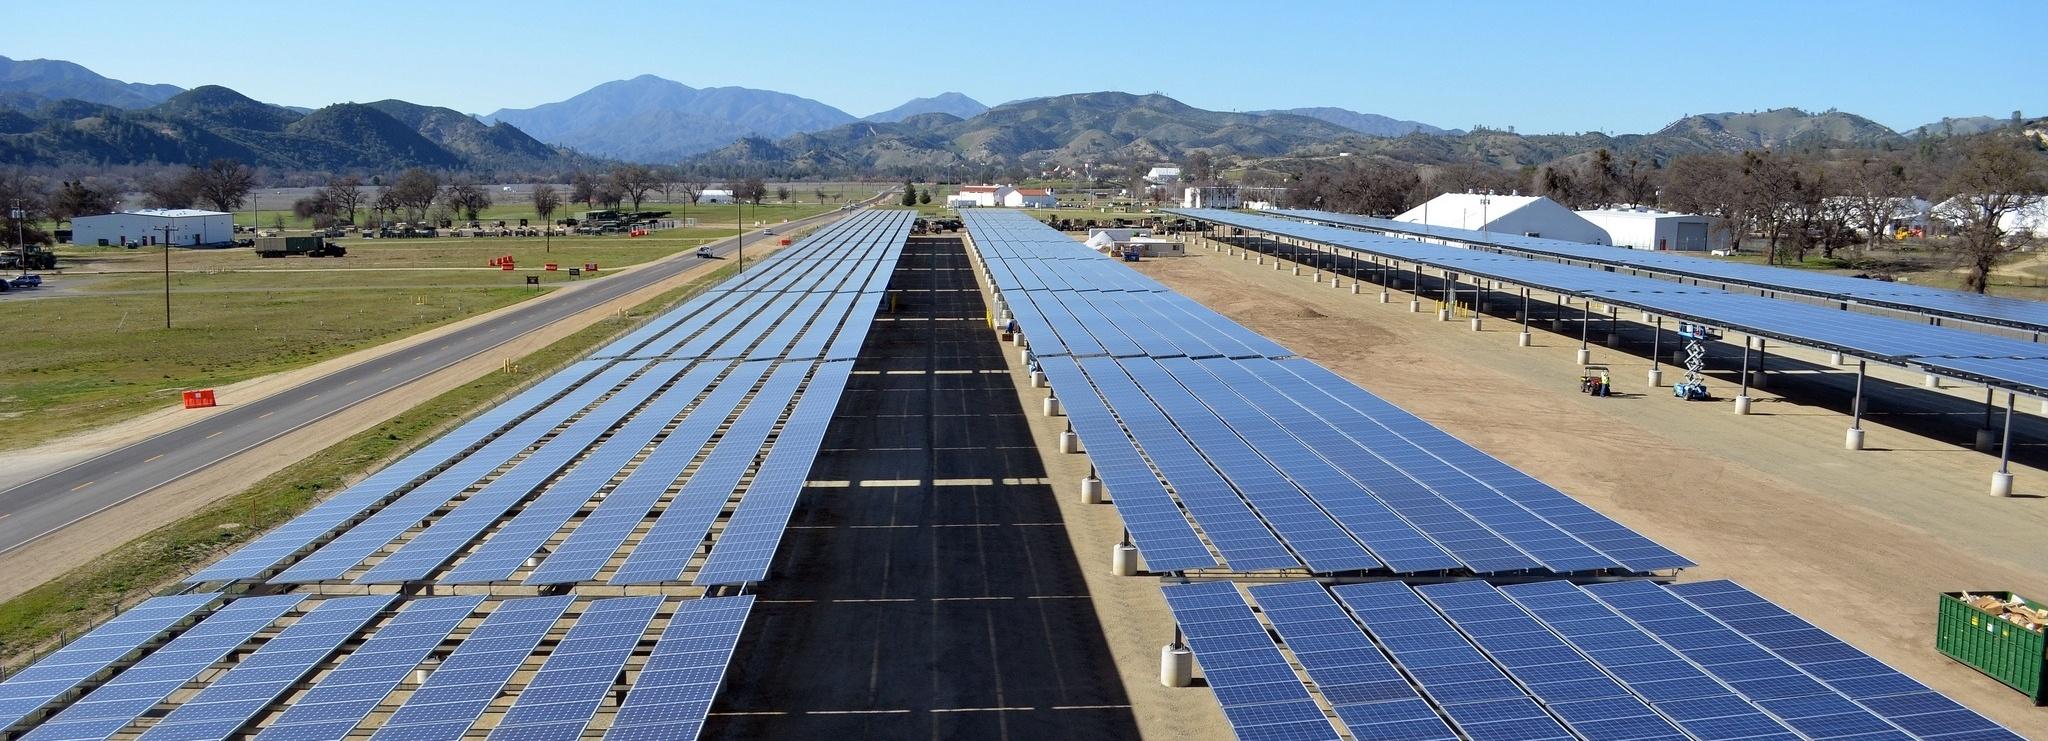 california-solar-by-usace-815821-edited.jpg